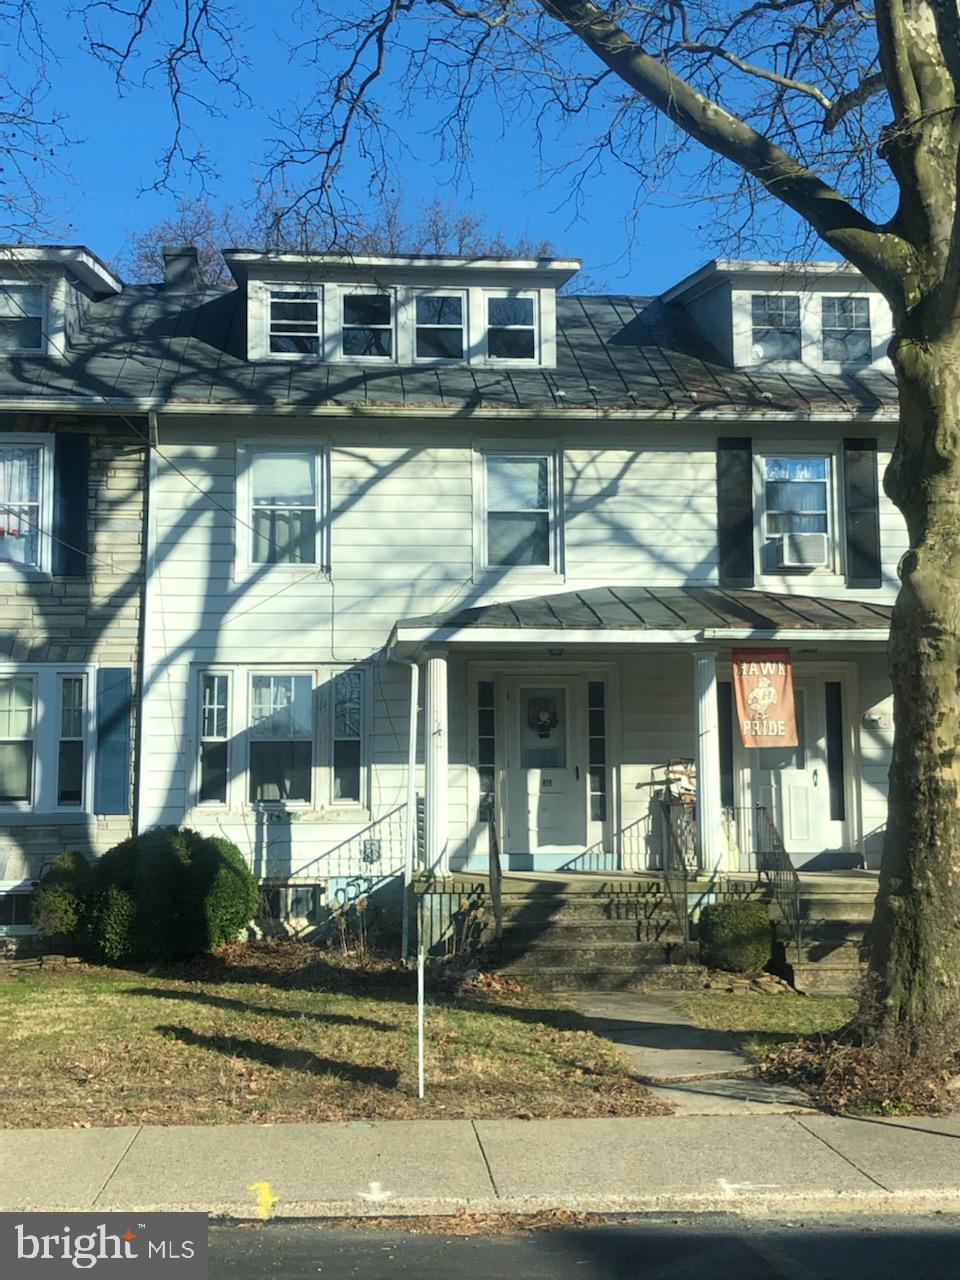 819 MAIN STREET, SHOEMAKERSVILLE, PA 19555